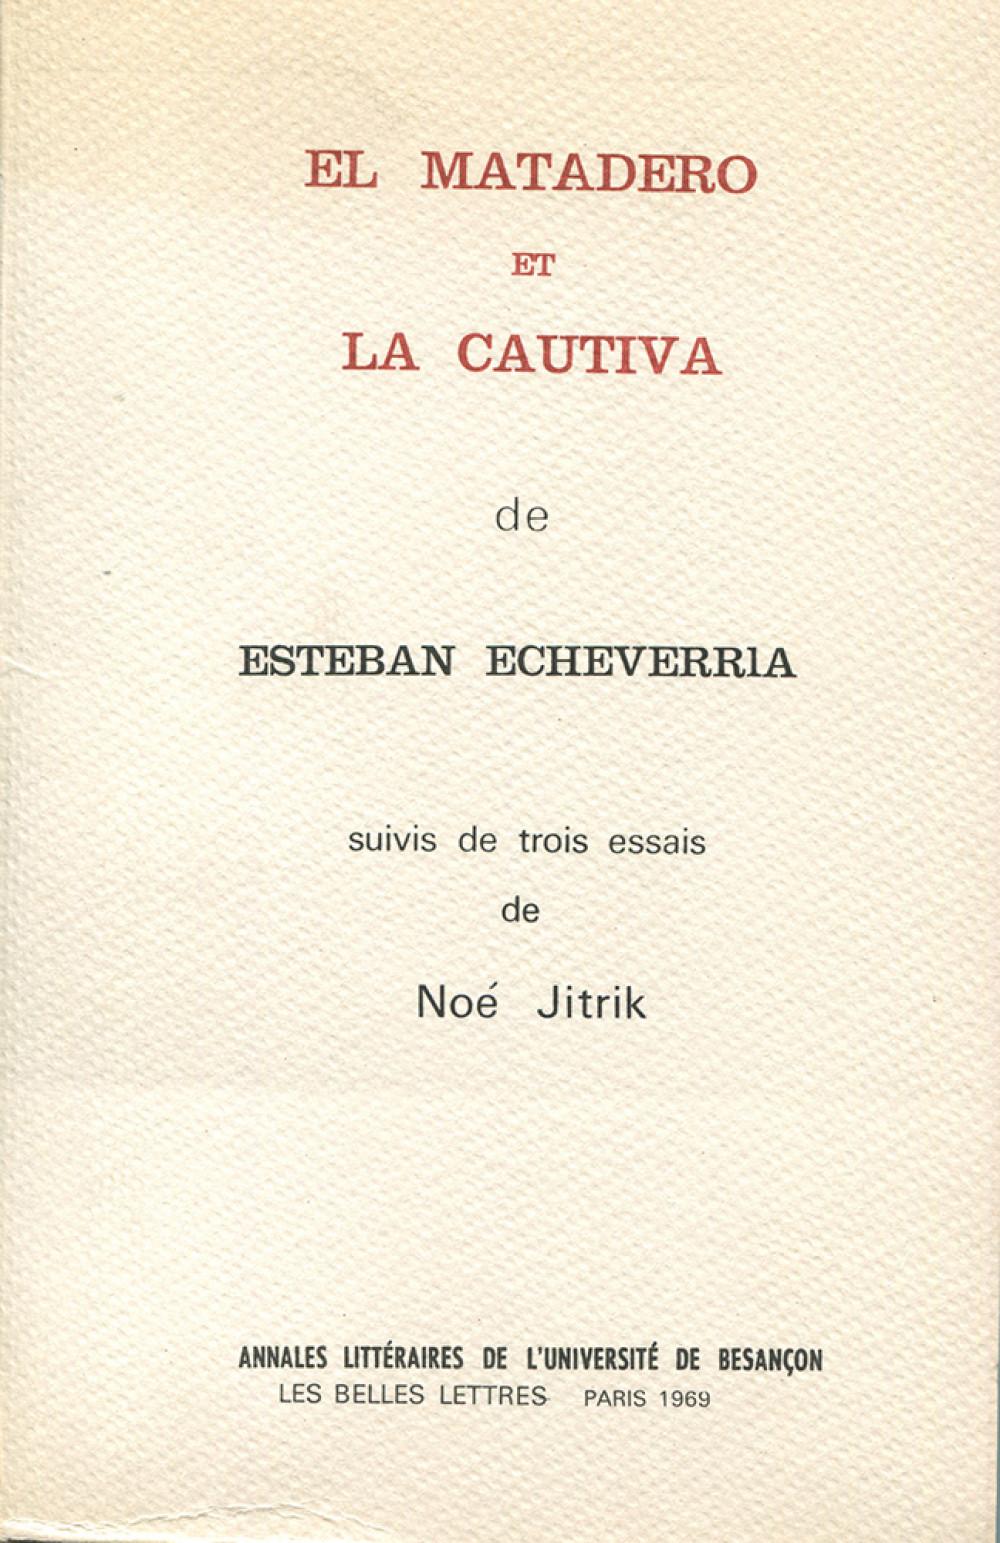 El matadero et la cautiva d'Esteban Echevarria